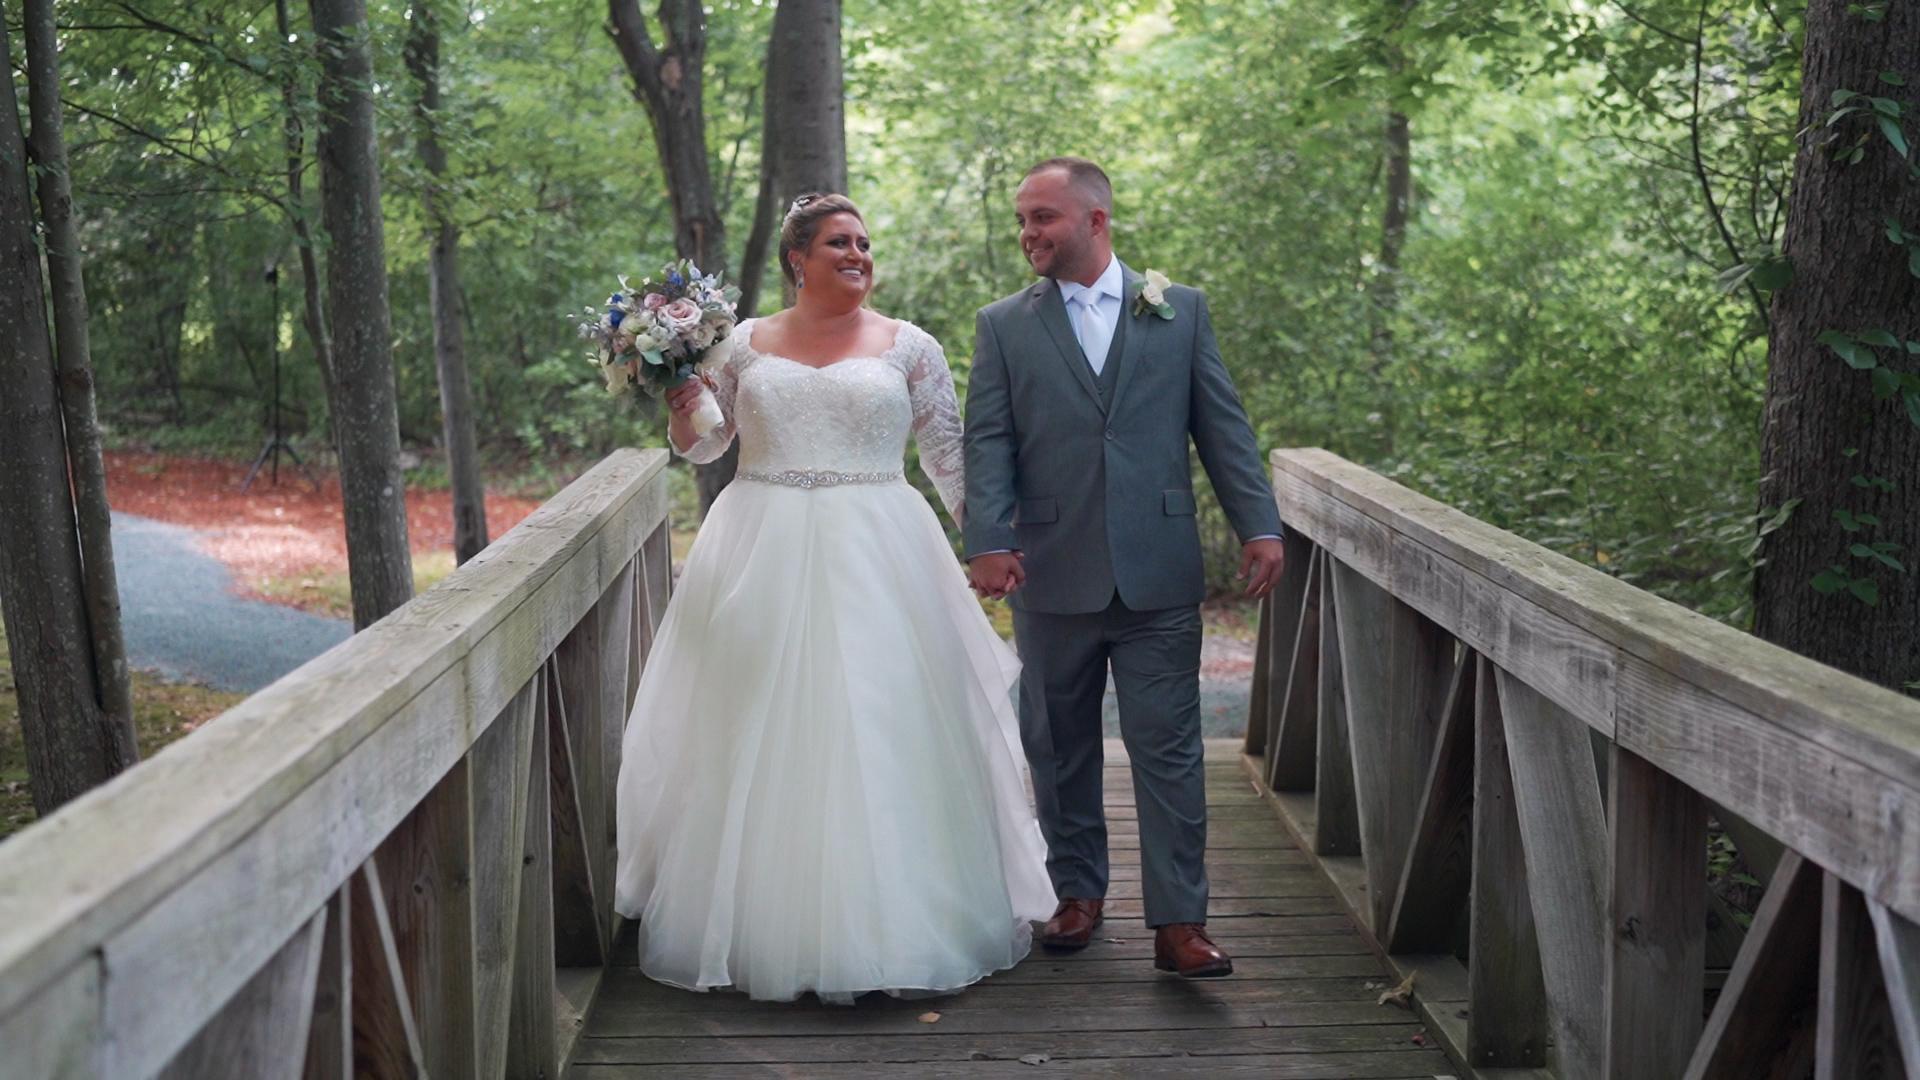 Danielle + Brendan  | Norwood, Massachusetts | Four Points Sheraton Norwood